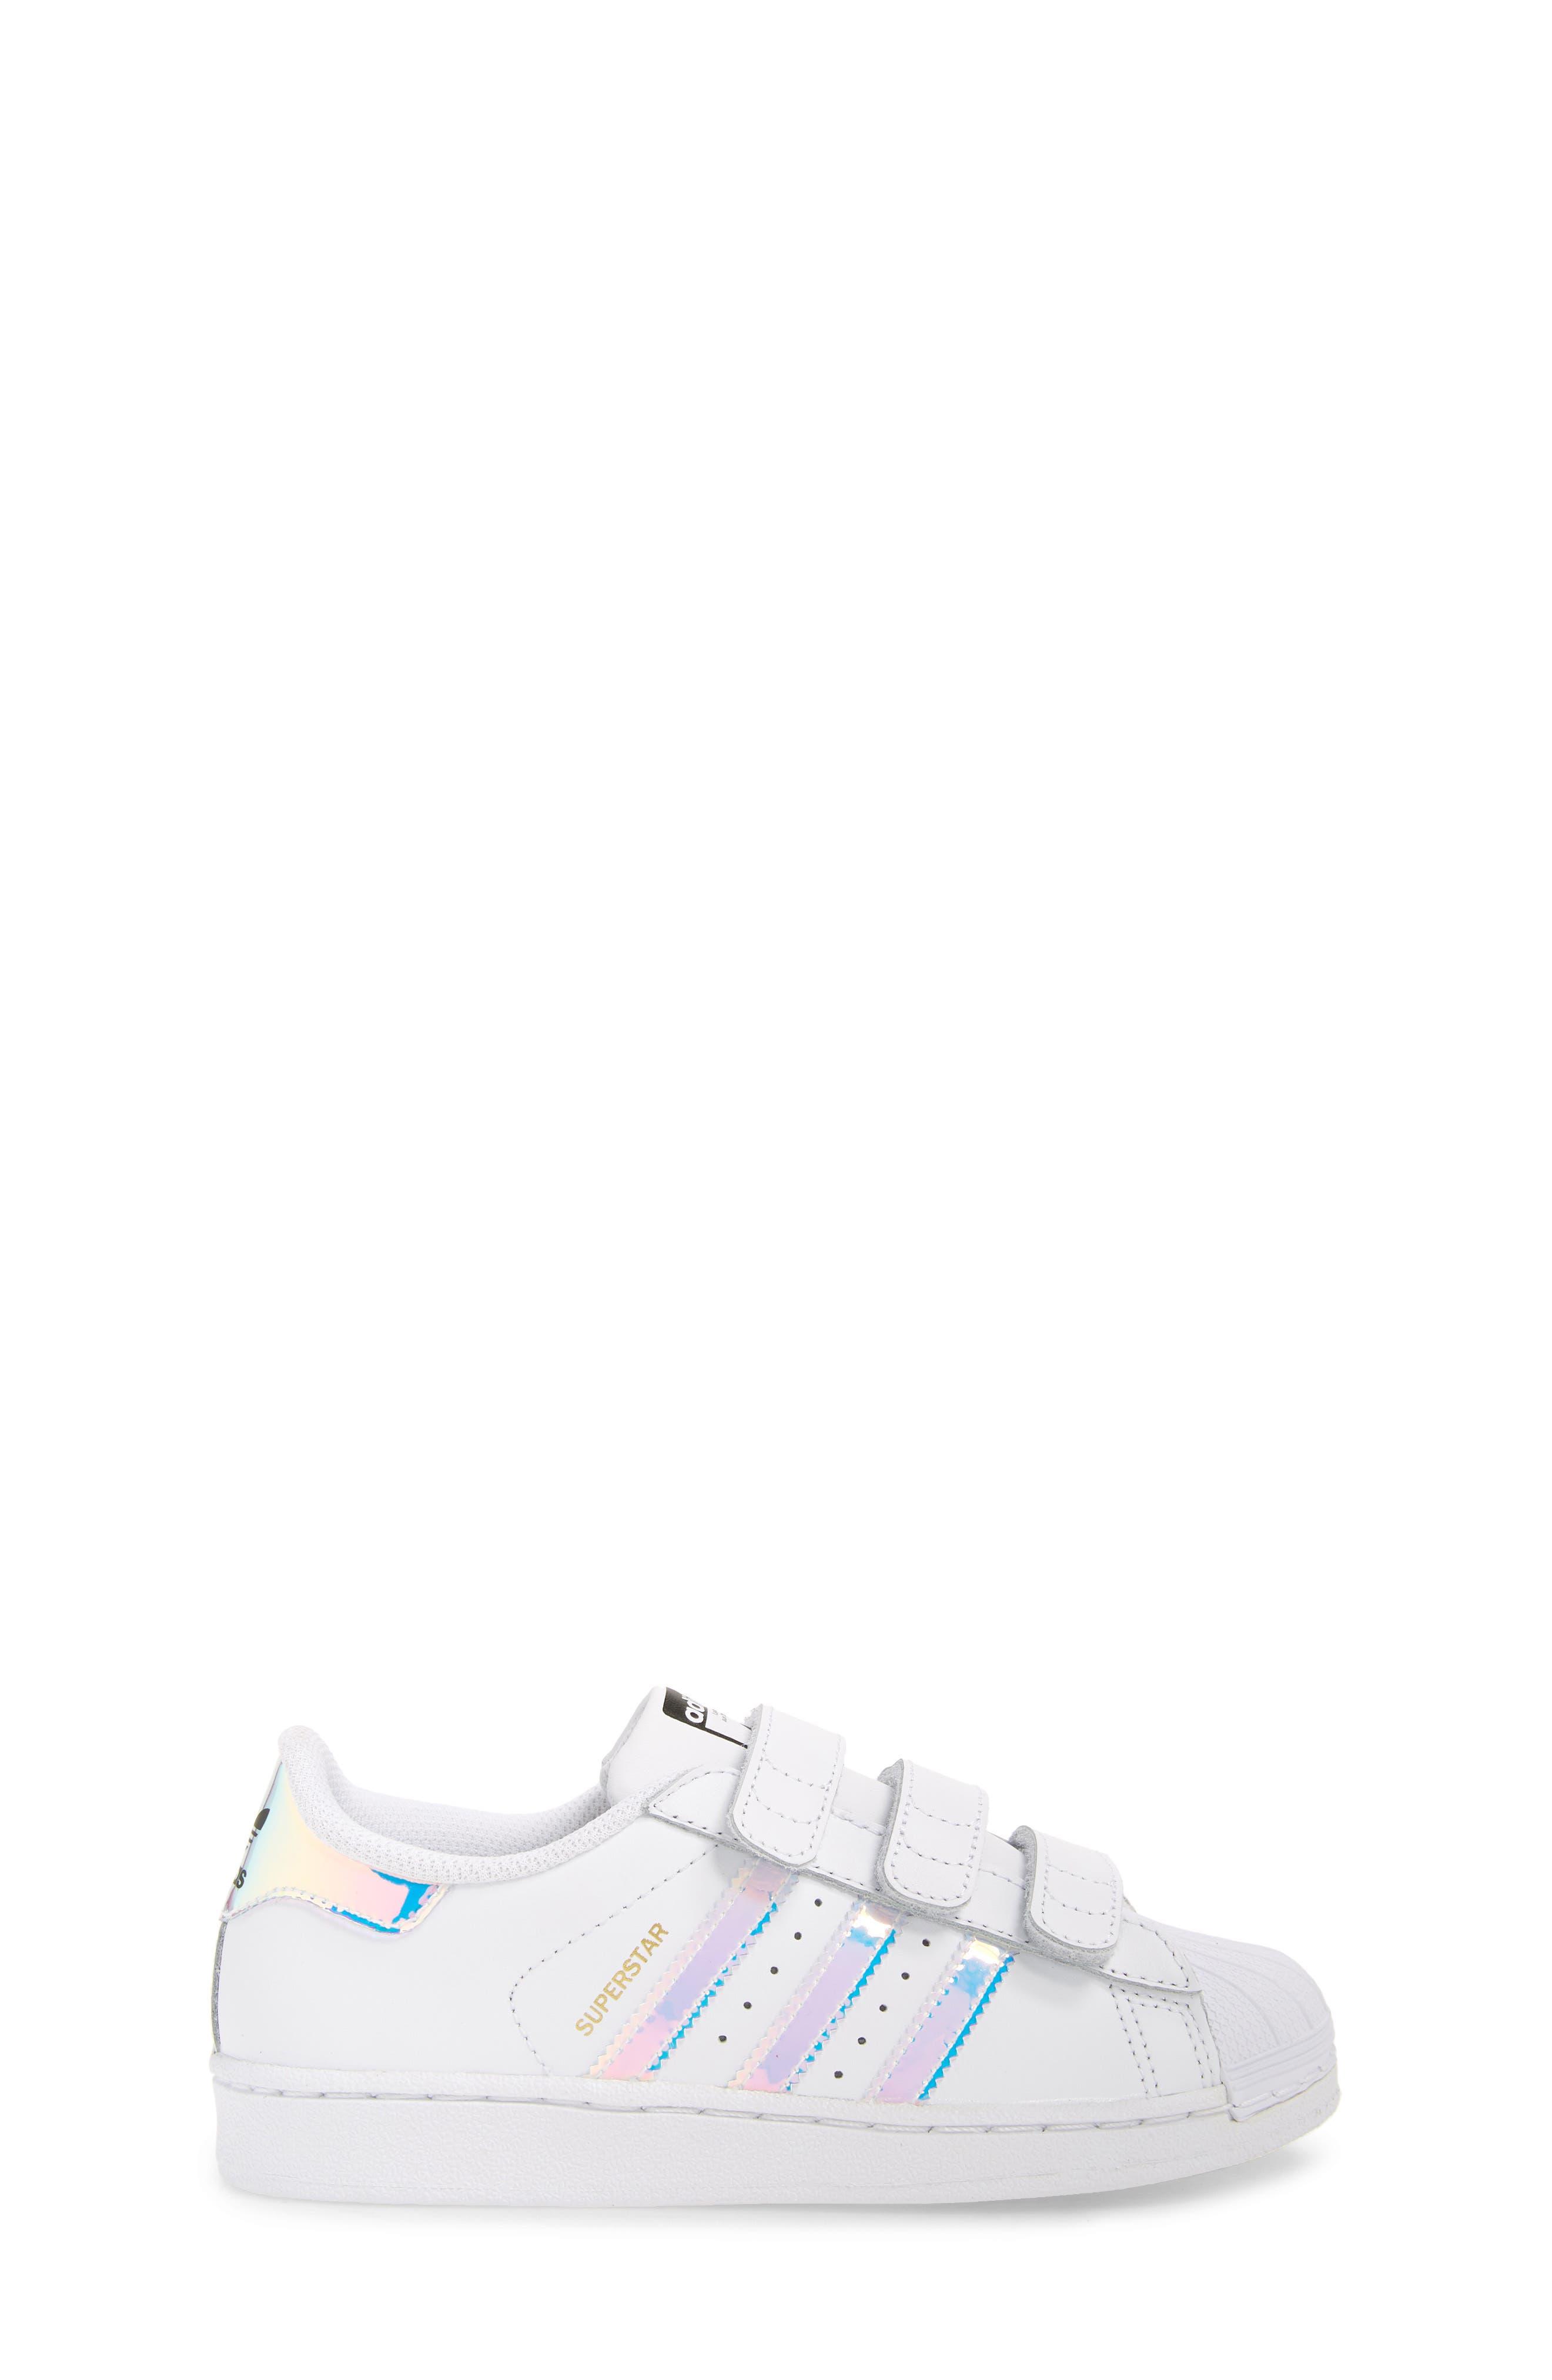 Superstar - Iridescent Sneaker,                             Alternate thumbnail 3, color,                             100